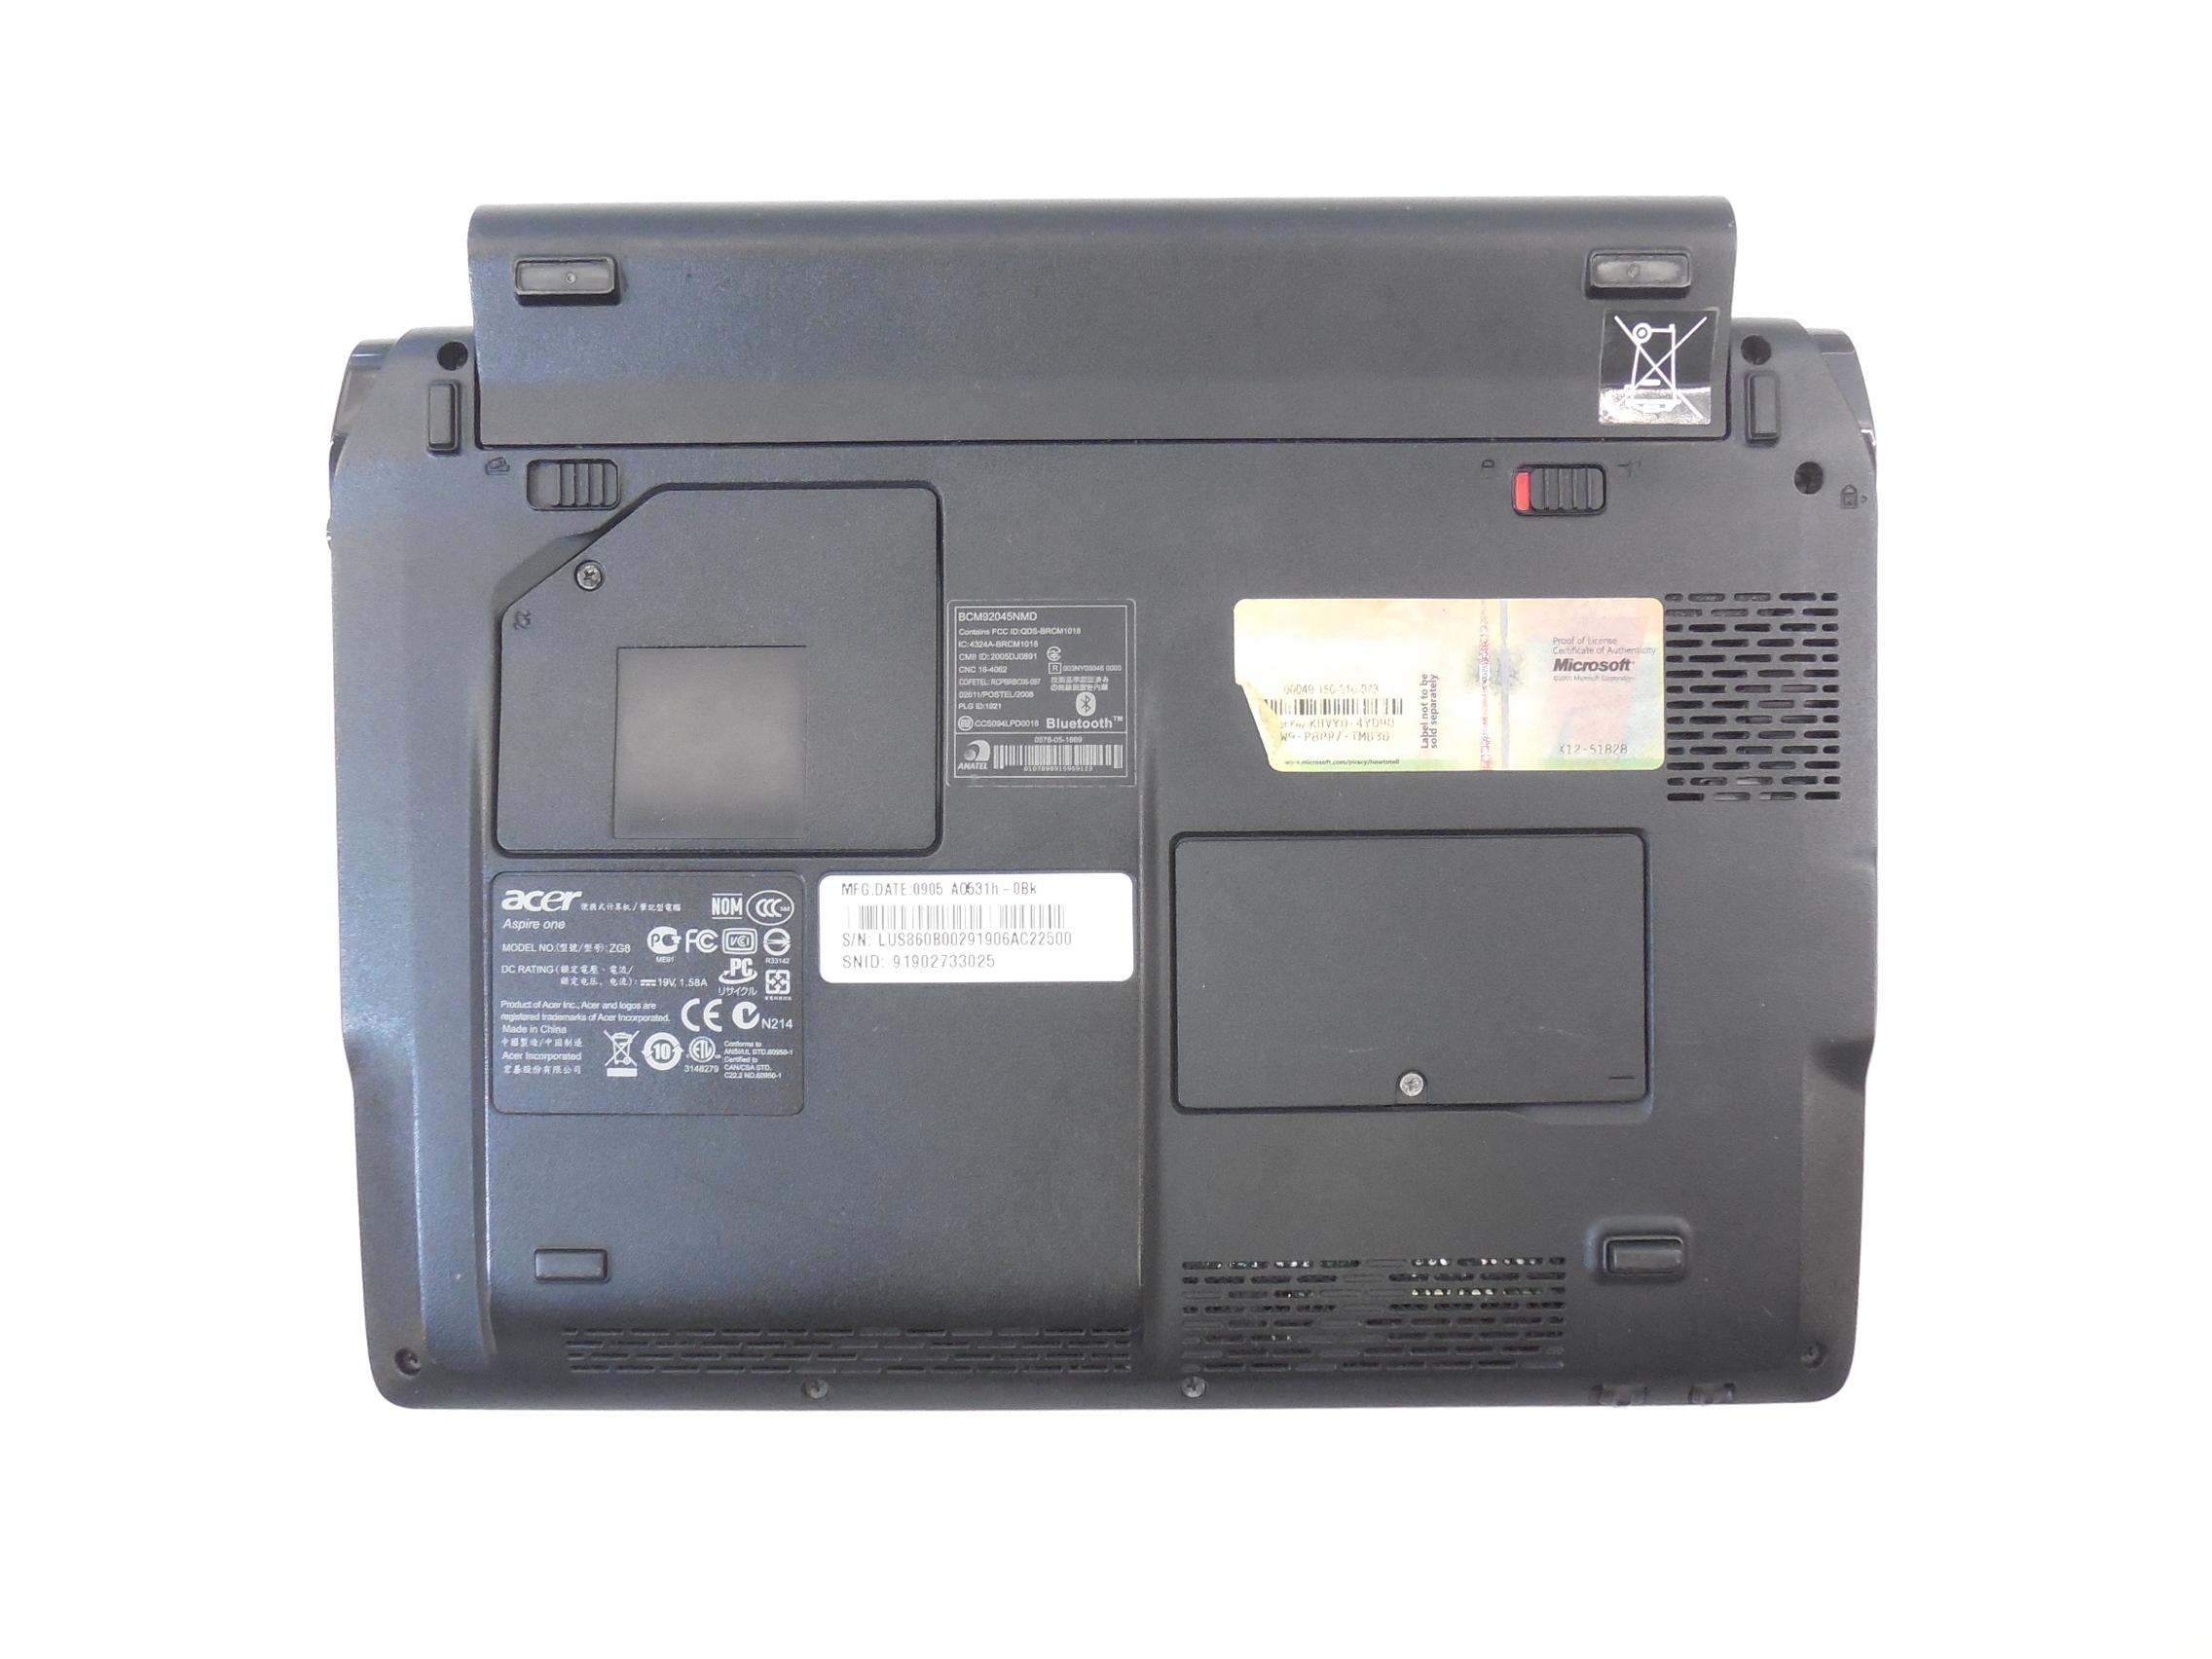 Нетбук Acer Aspire One AO531h